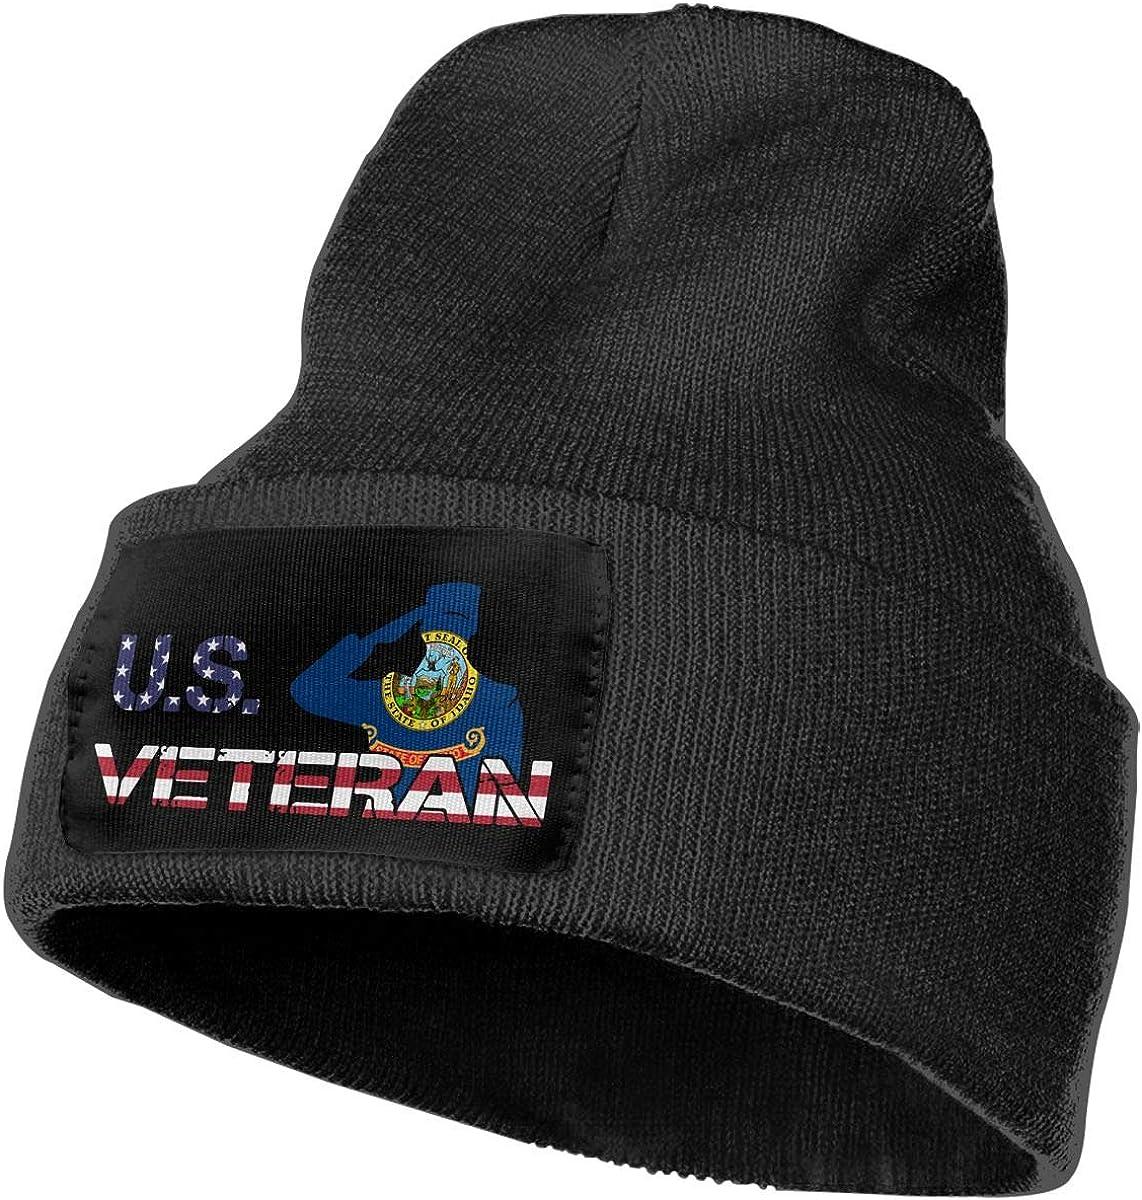 COLLJL-8 Men//Women American Veterans Day Idaho Flag Outdoor Warm Knit Beanies Hat Soft Winter Skull Caps